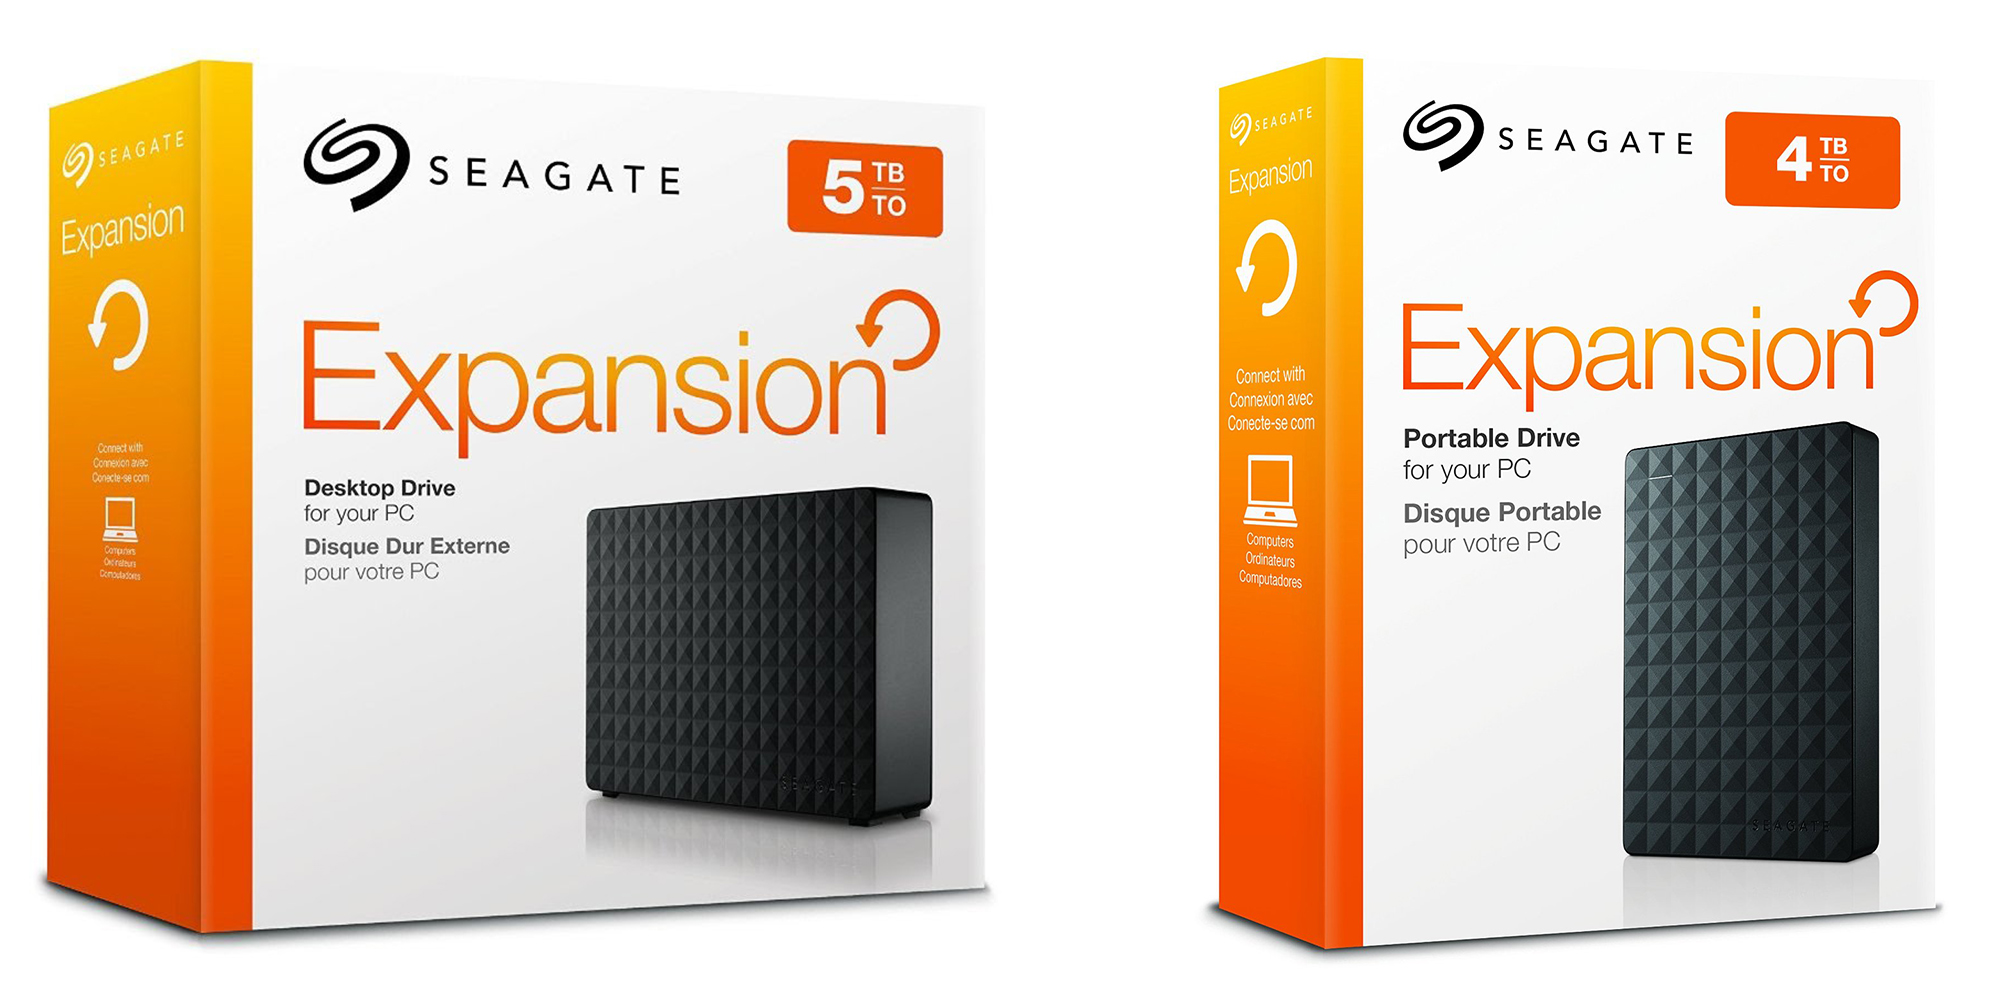 seagate-expansion-desktop-portable-hard-drives